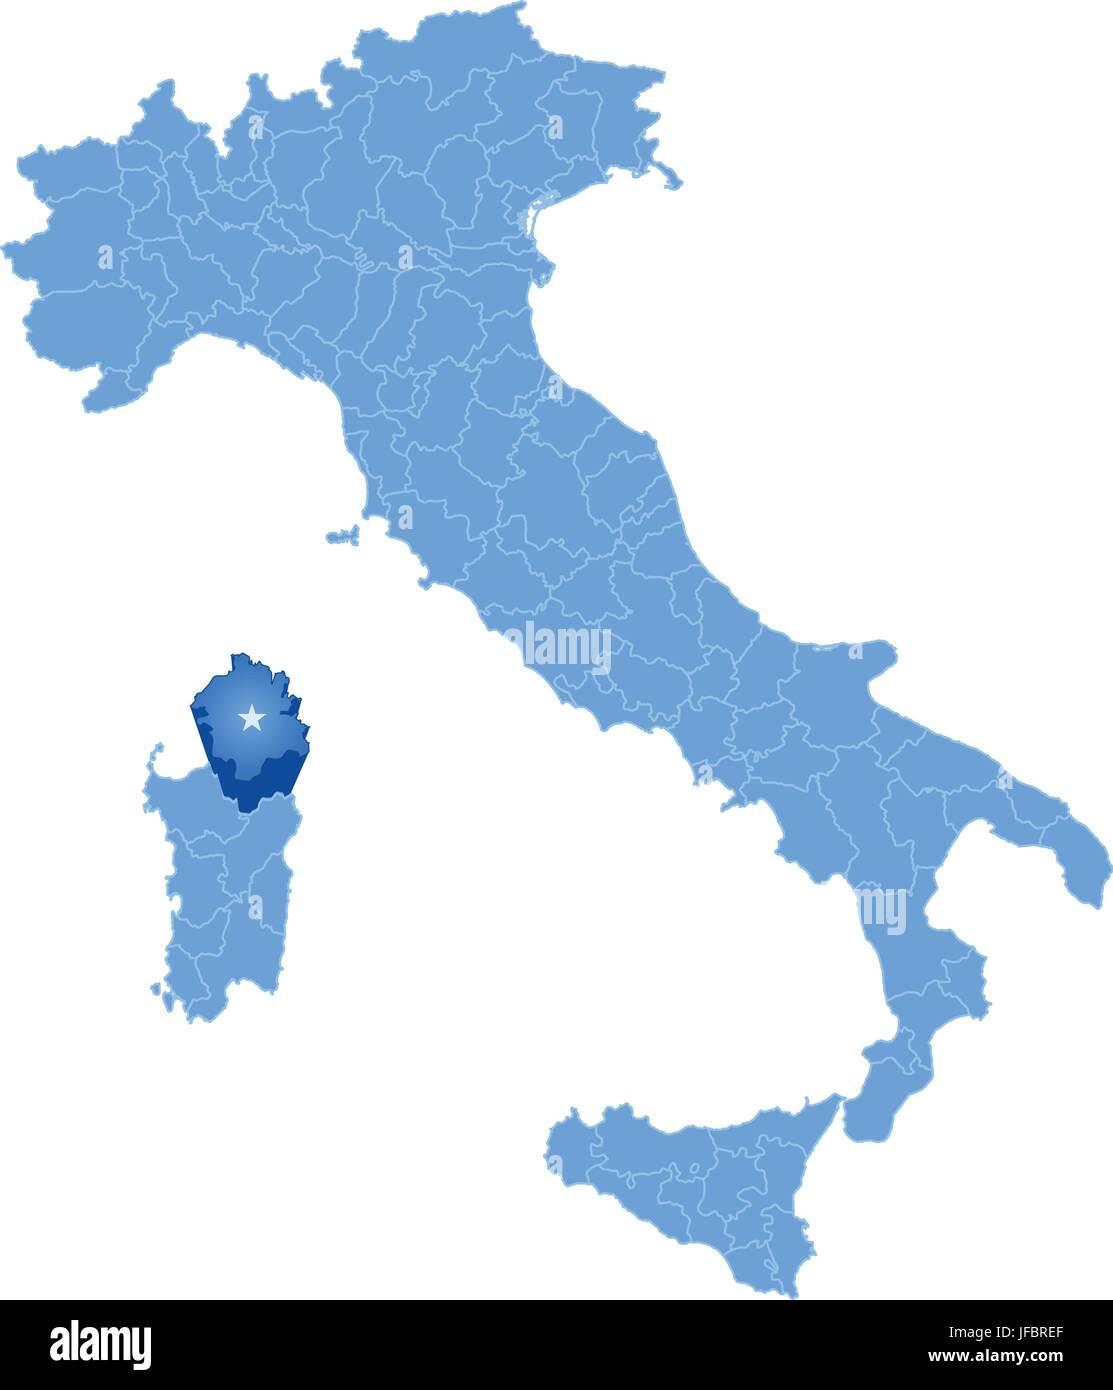 Map of Italy, Olbia-Tempio - Stock Image